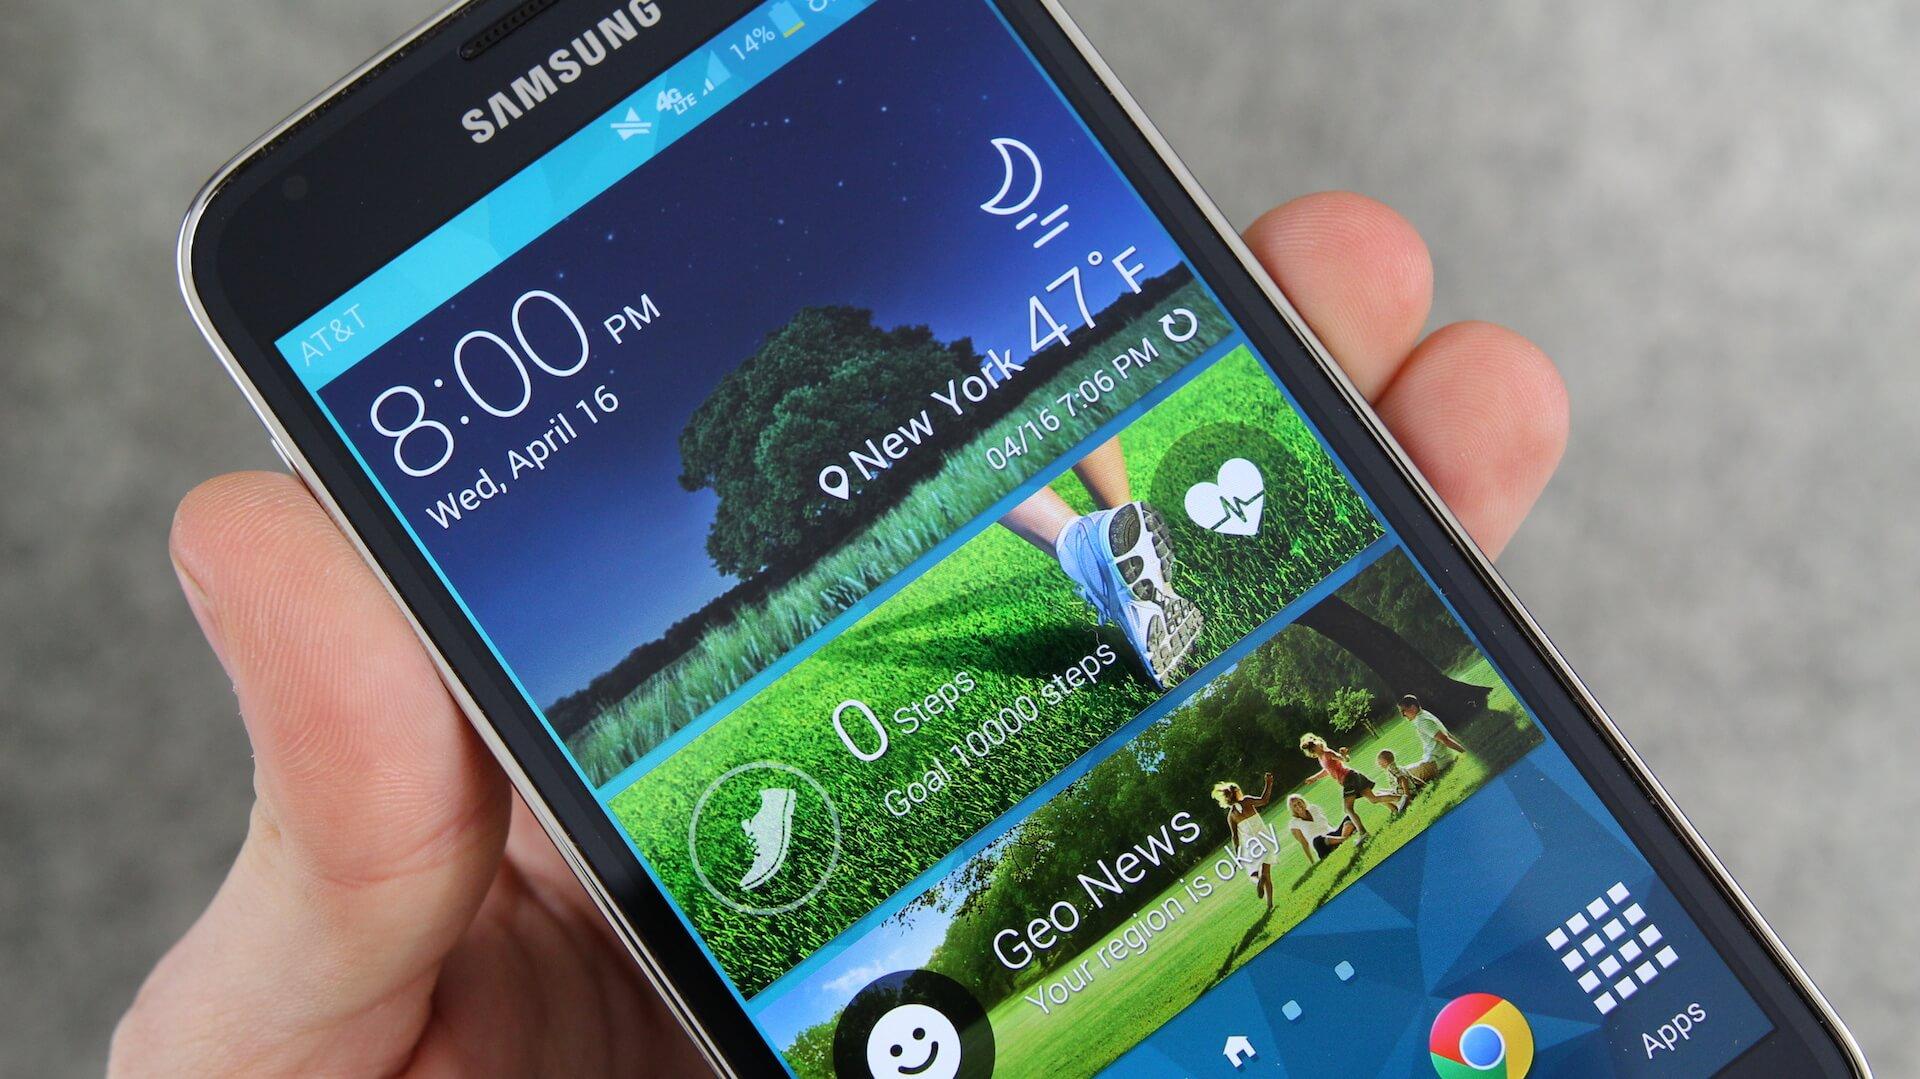 TouchWiz в Galaxy S6 станет ближе к интерфейсу стокового Android